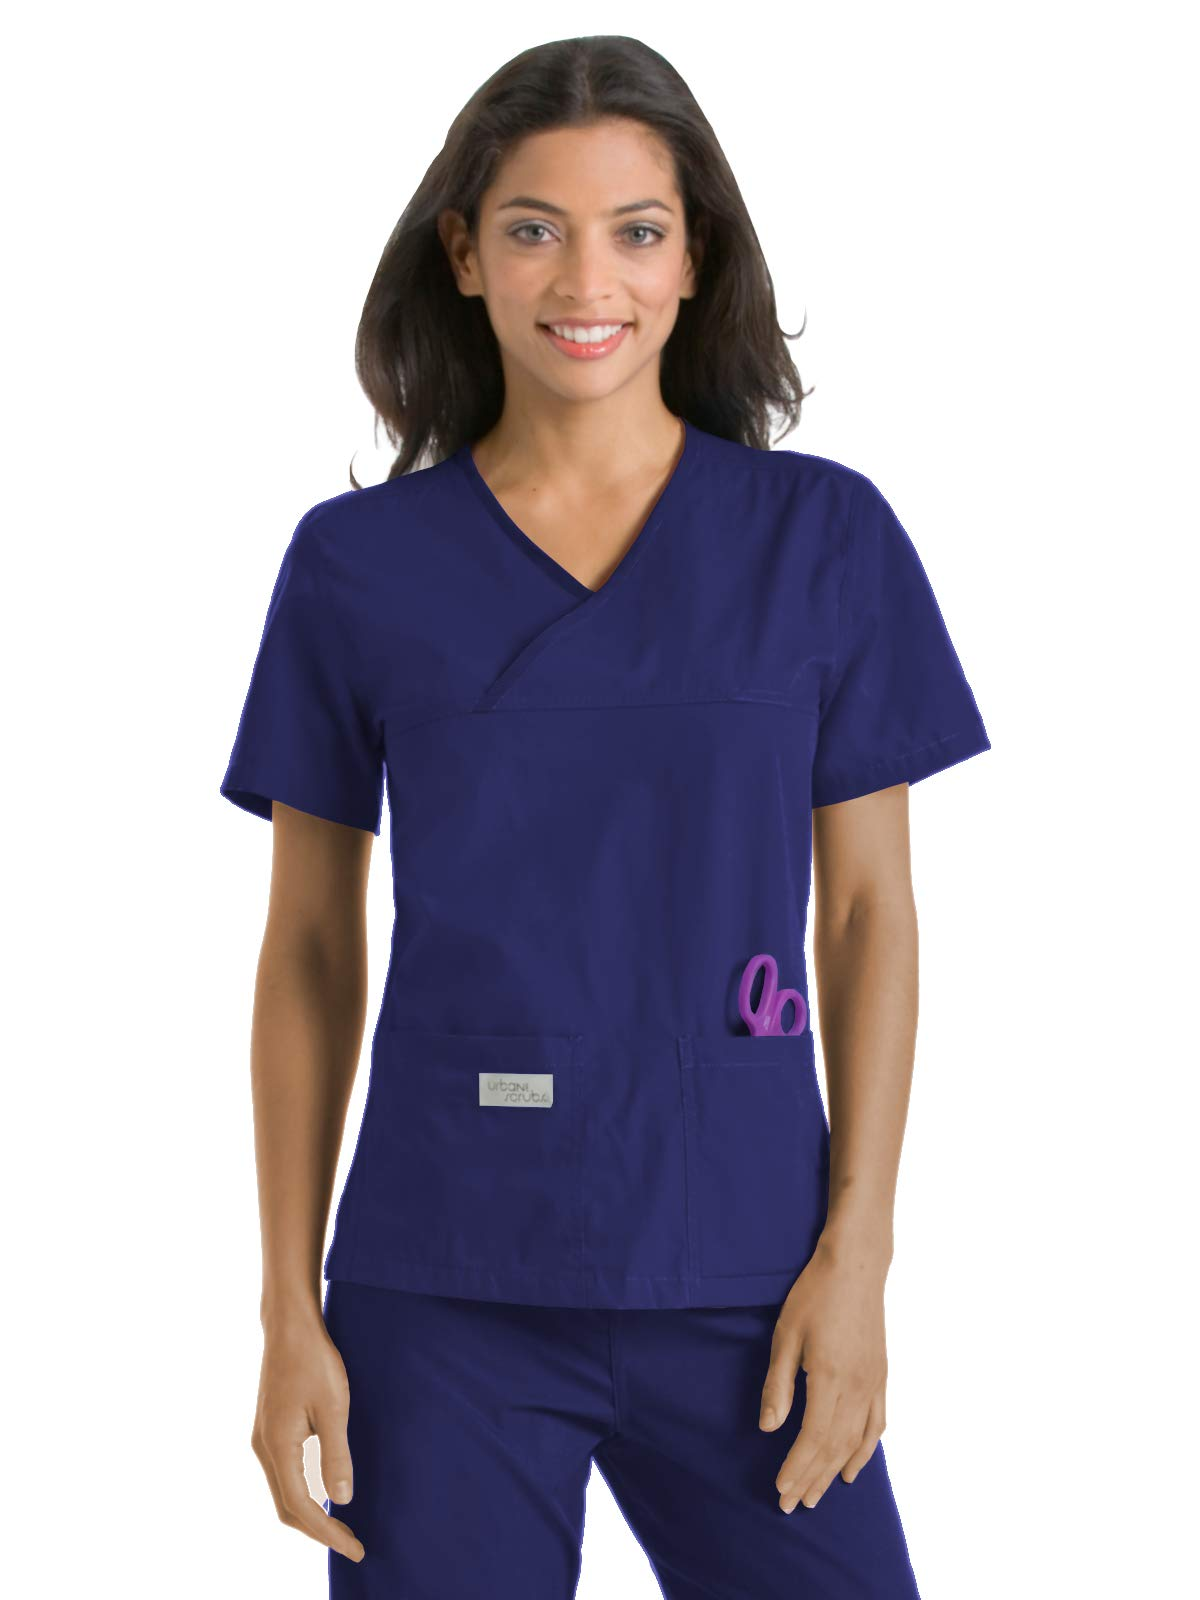 Landau Urbane Scrubs 9534 Women's Double Pocket Crossover Top